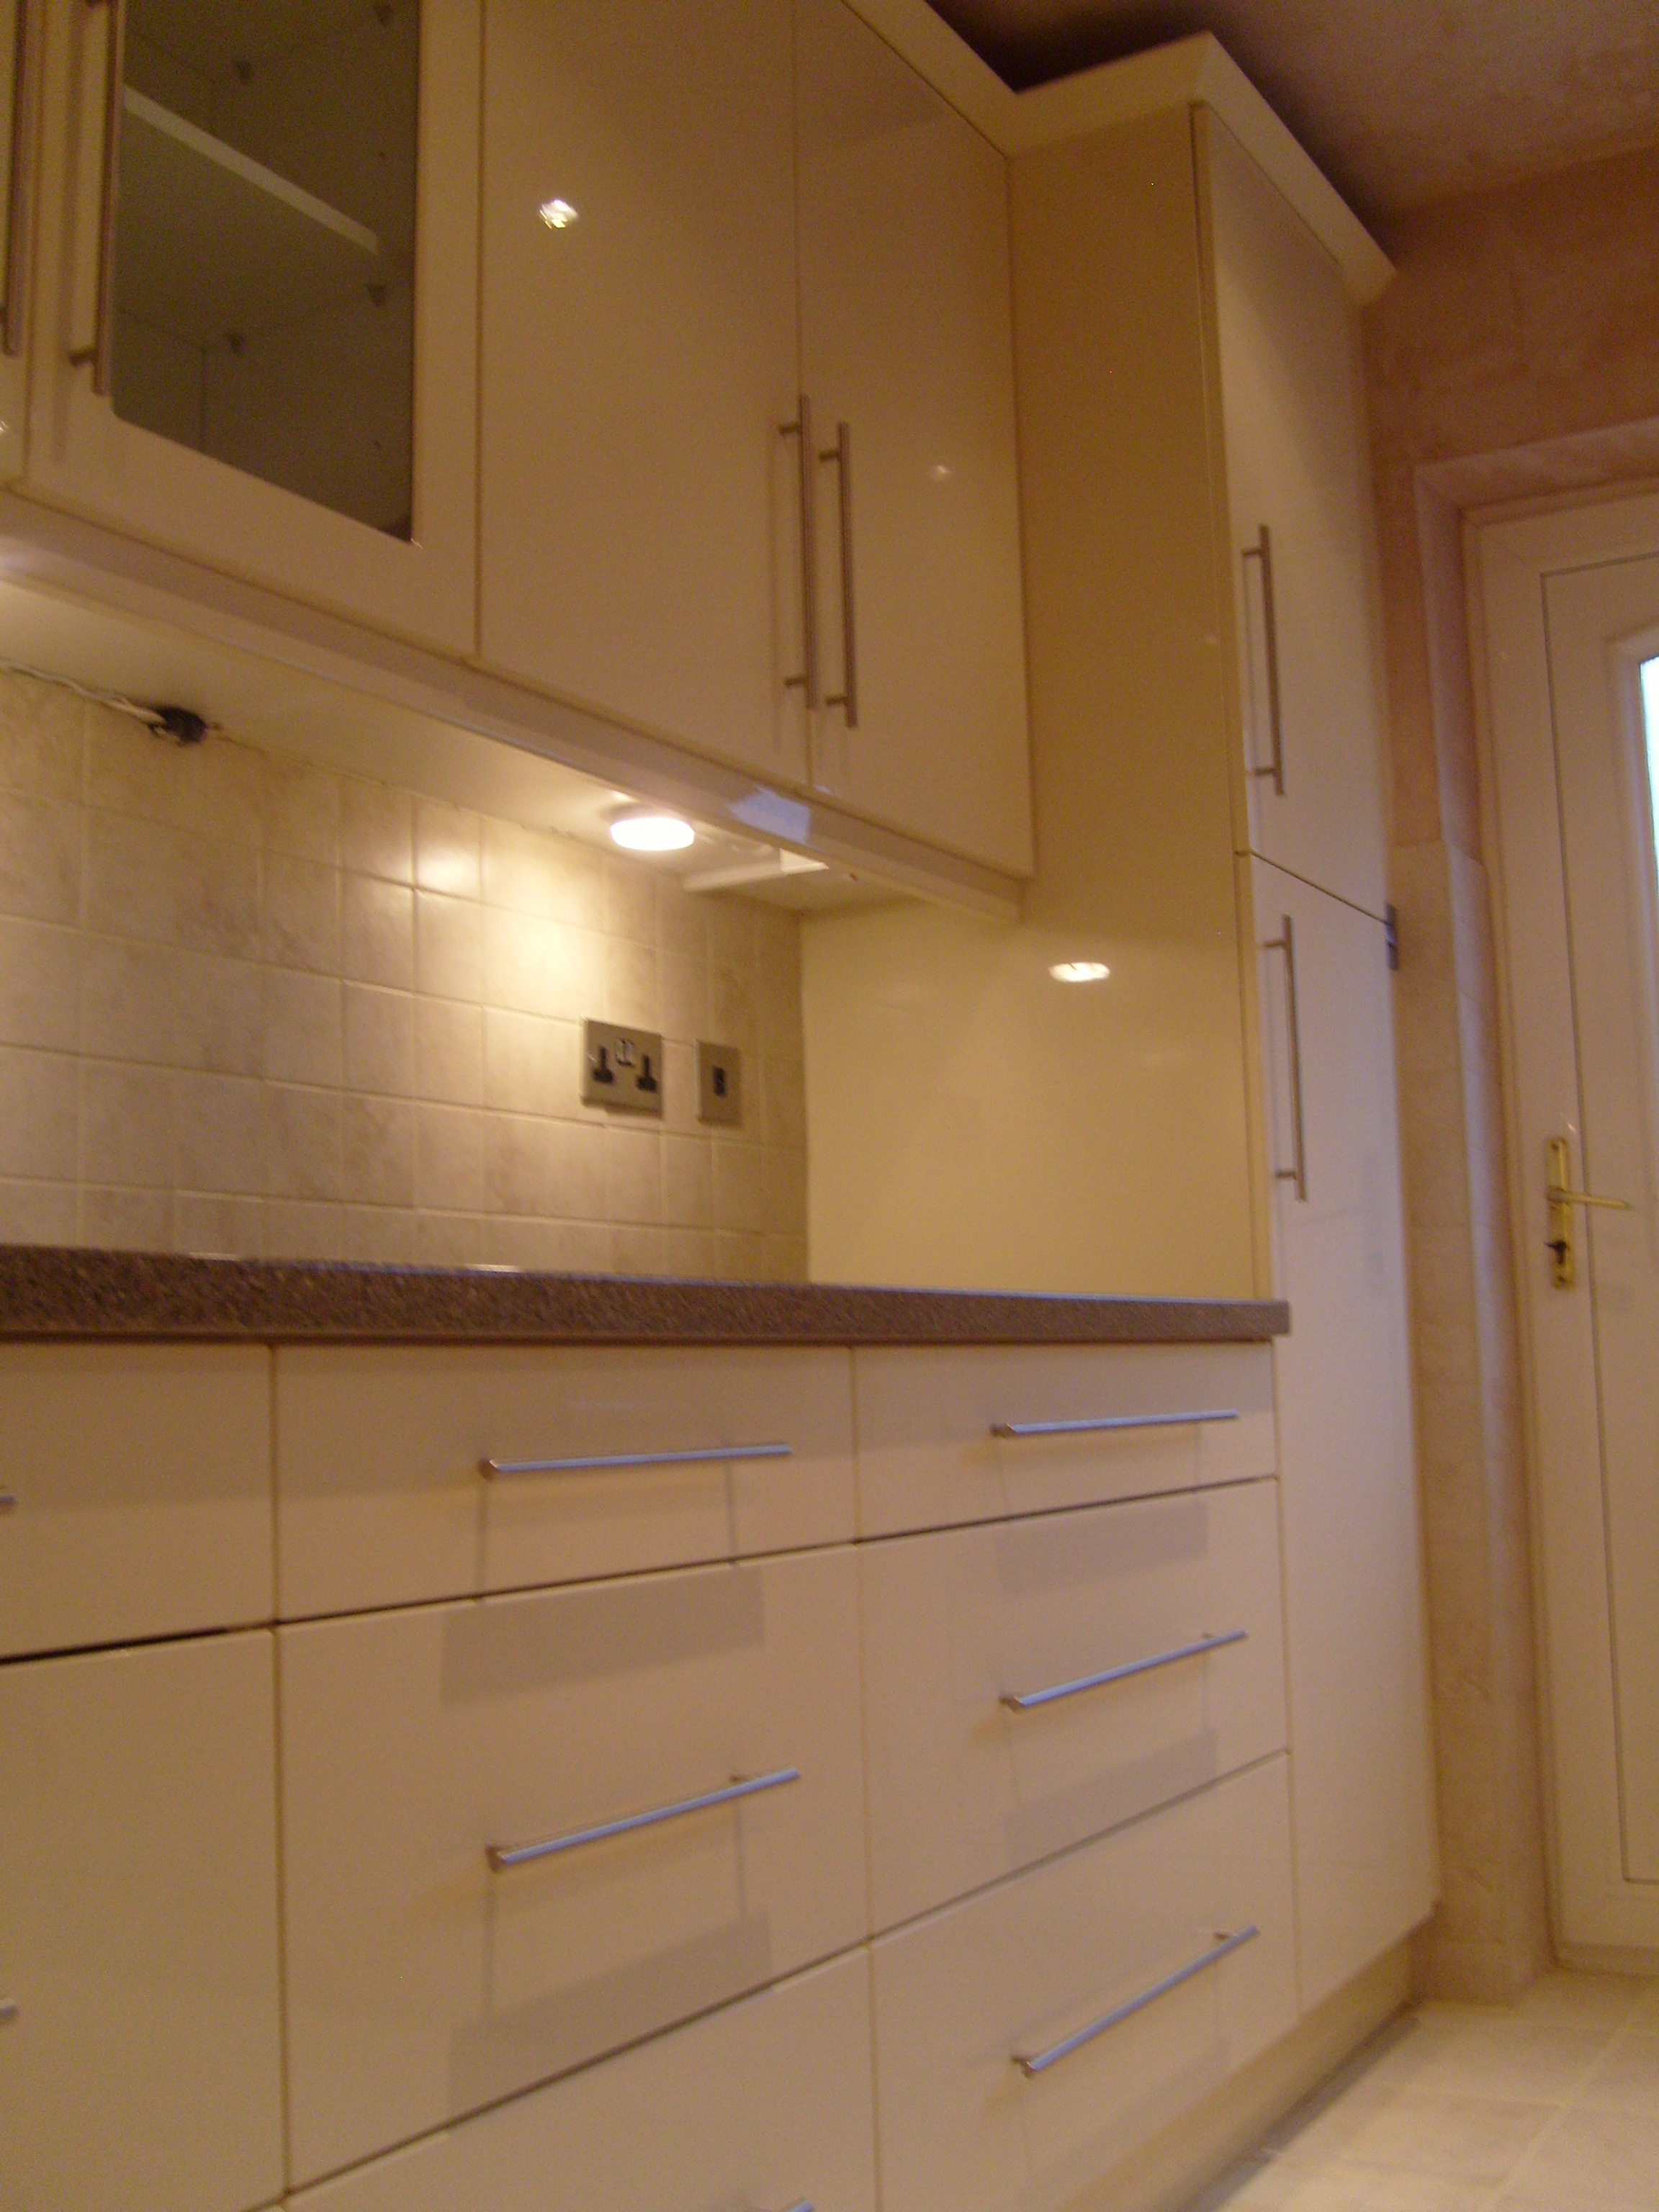 Fitted kitchen design in Sheffield